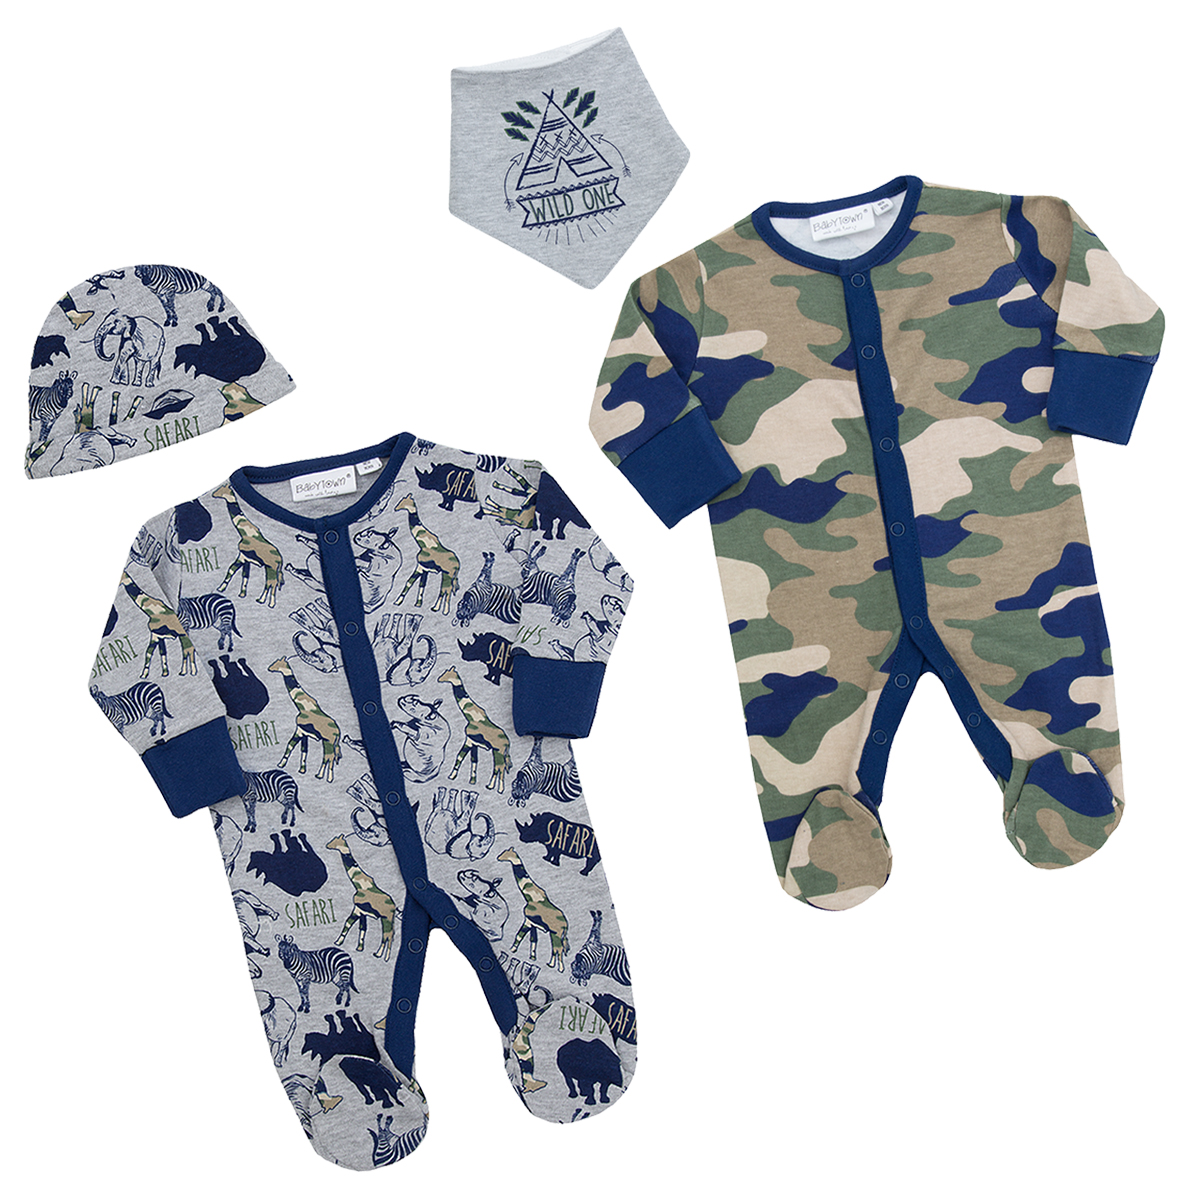 BABY TOWN Babies Sleepsuit//Babygro with Matching Hat or Bib ~ Newborn 9 Months